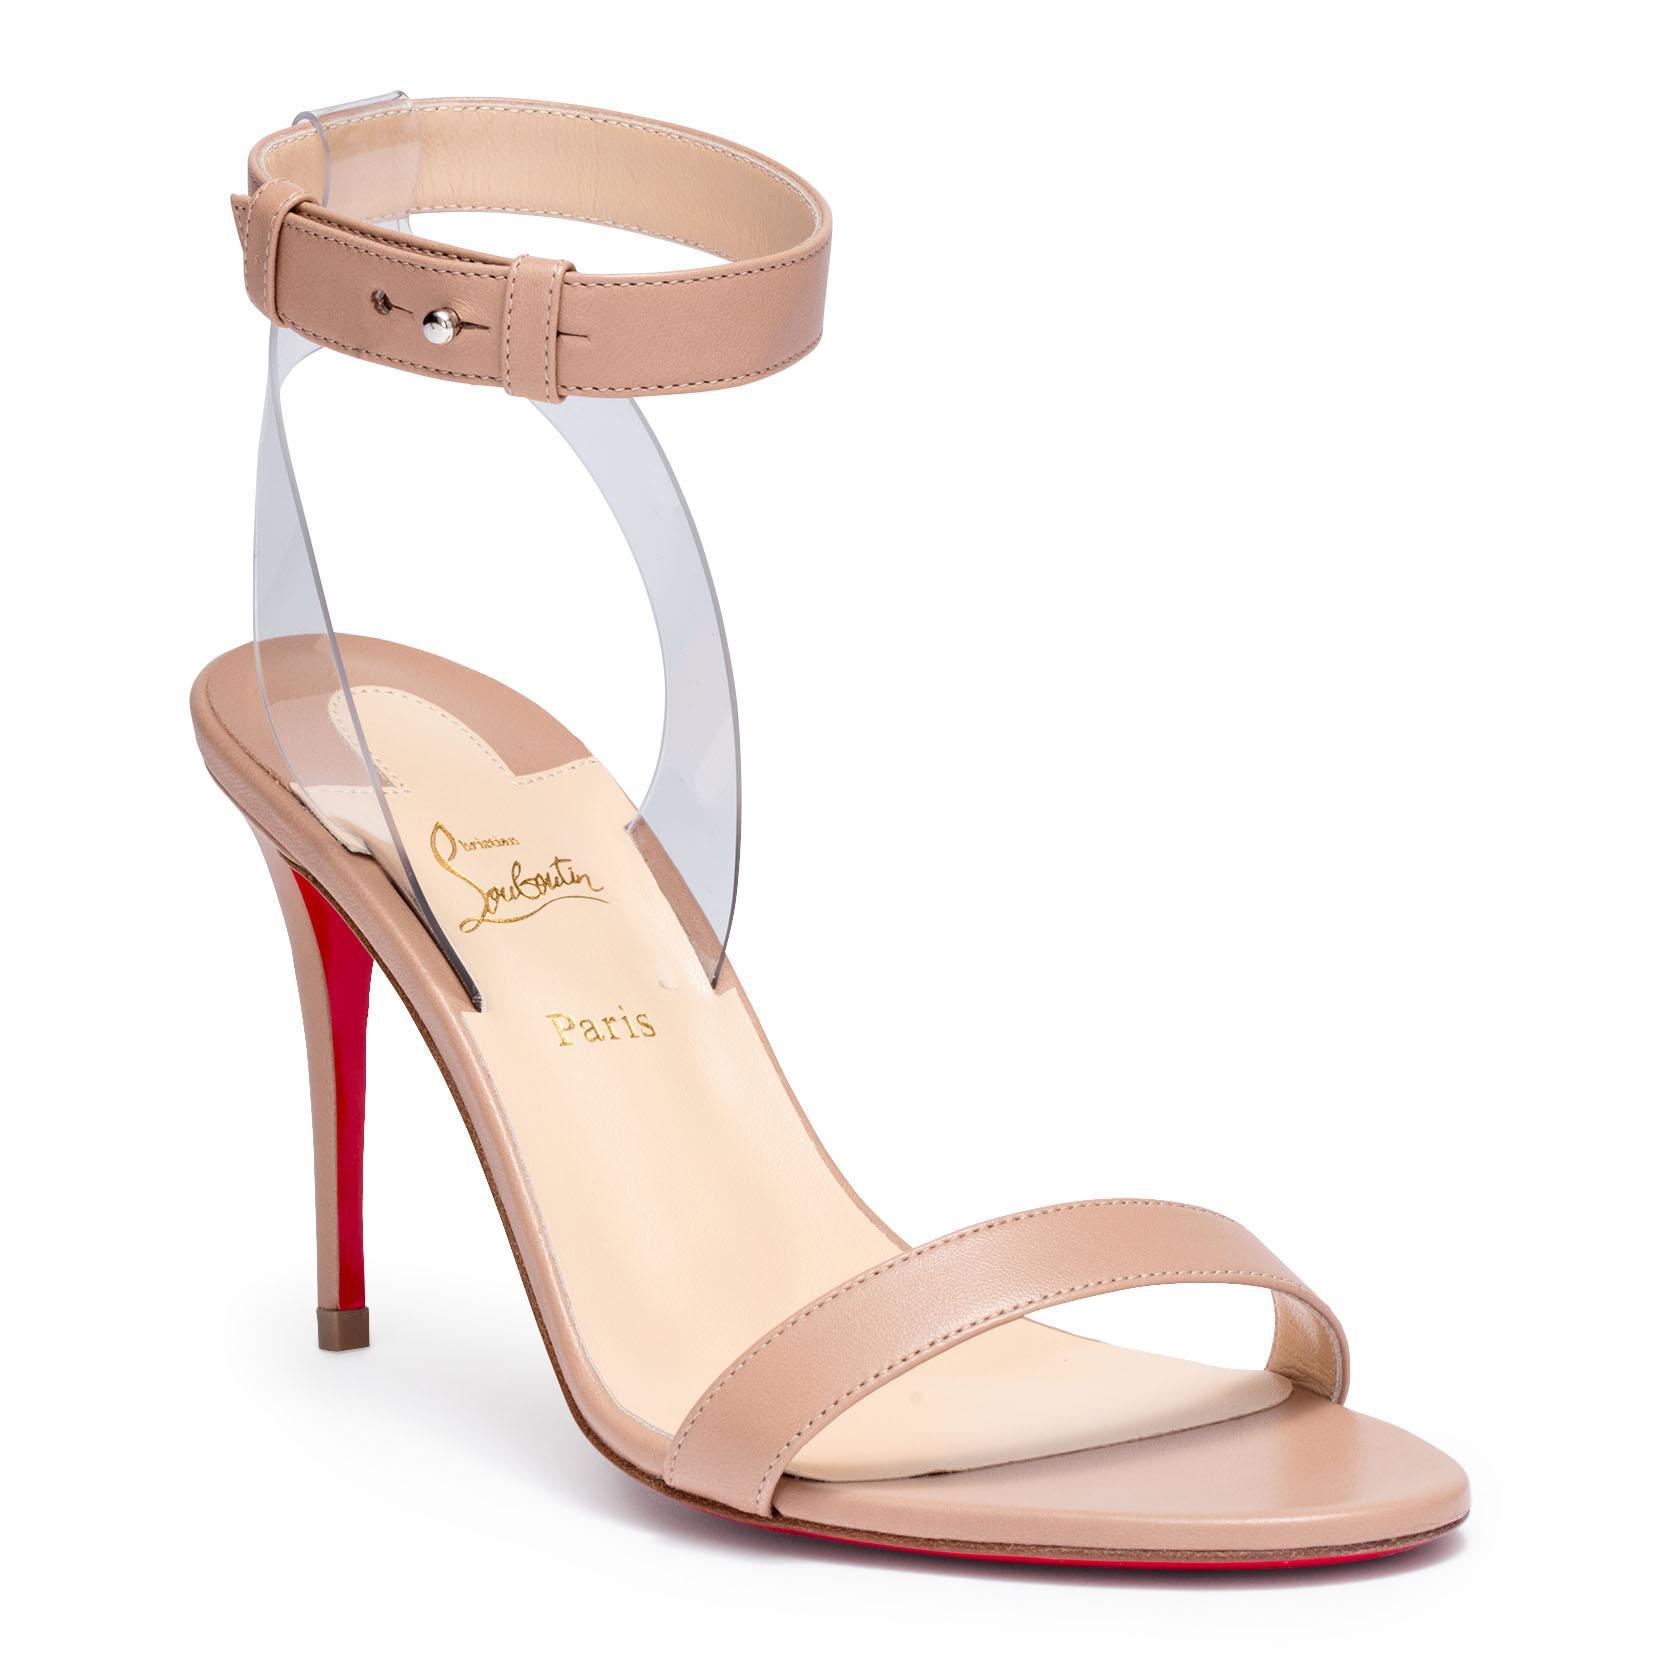 667e9f53b797 christian-louboutin--Jonatina-85-Beige-Leather-Sandals.jpeg